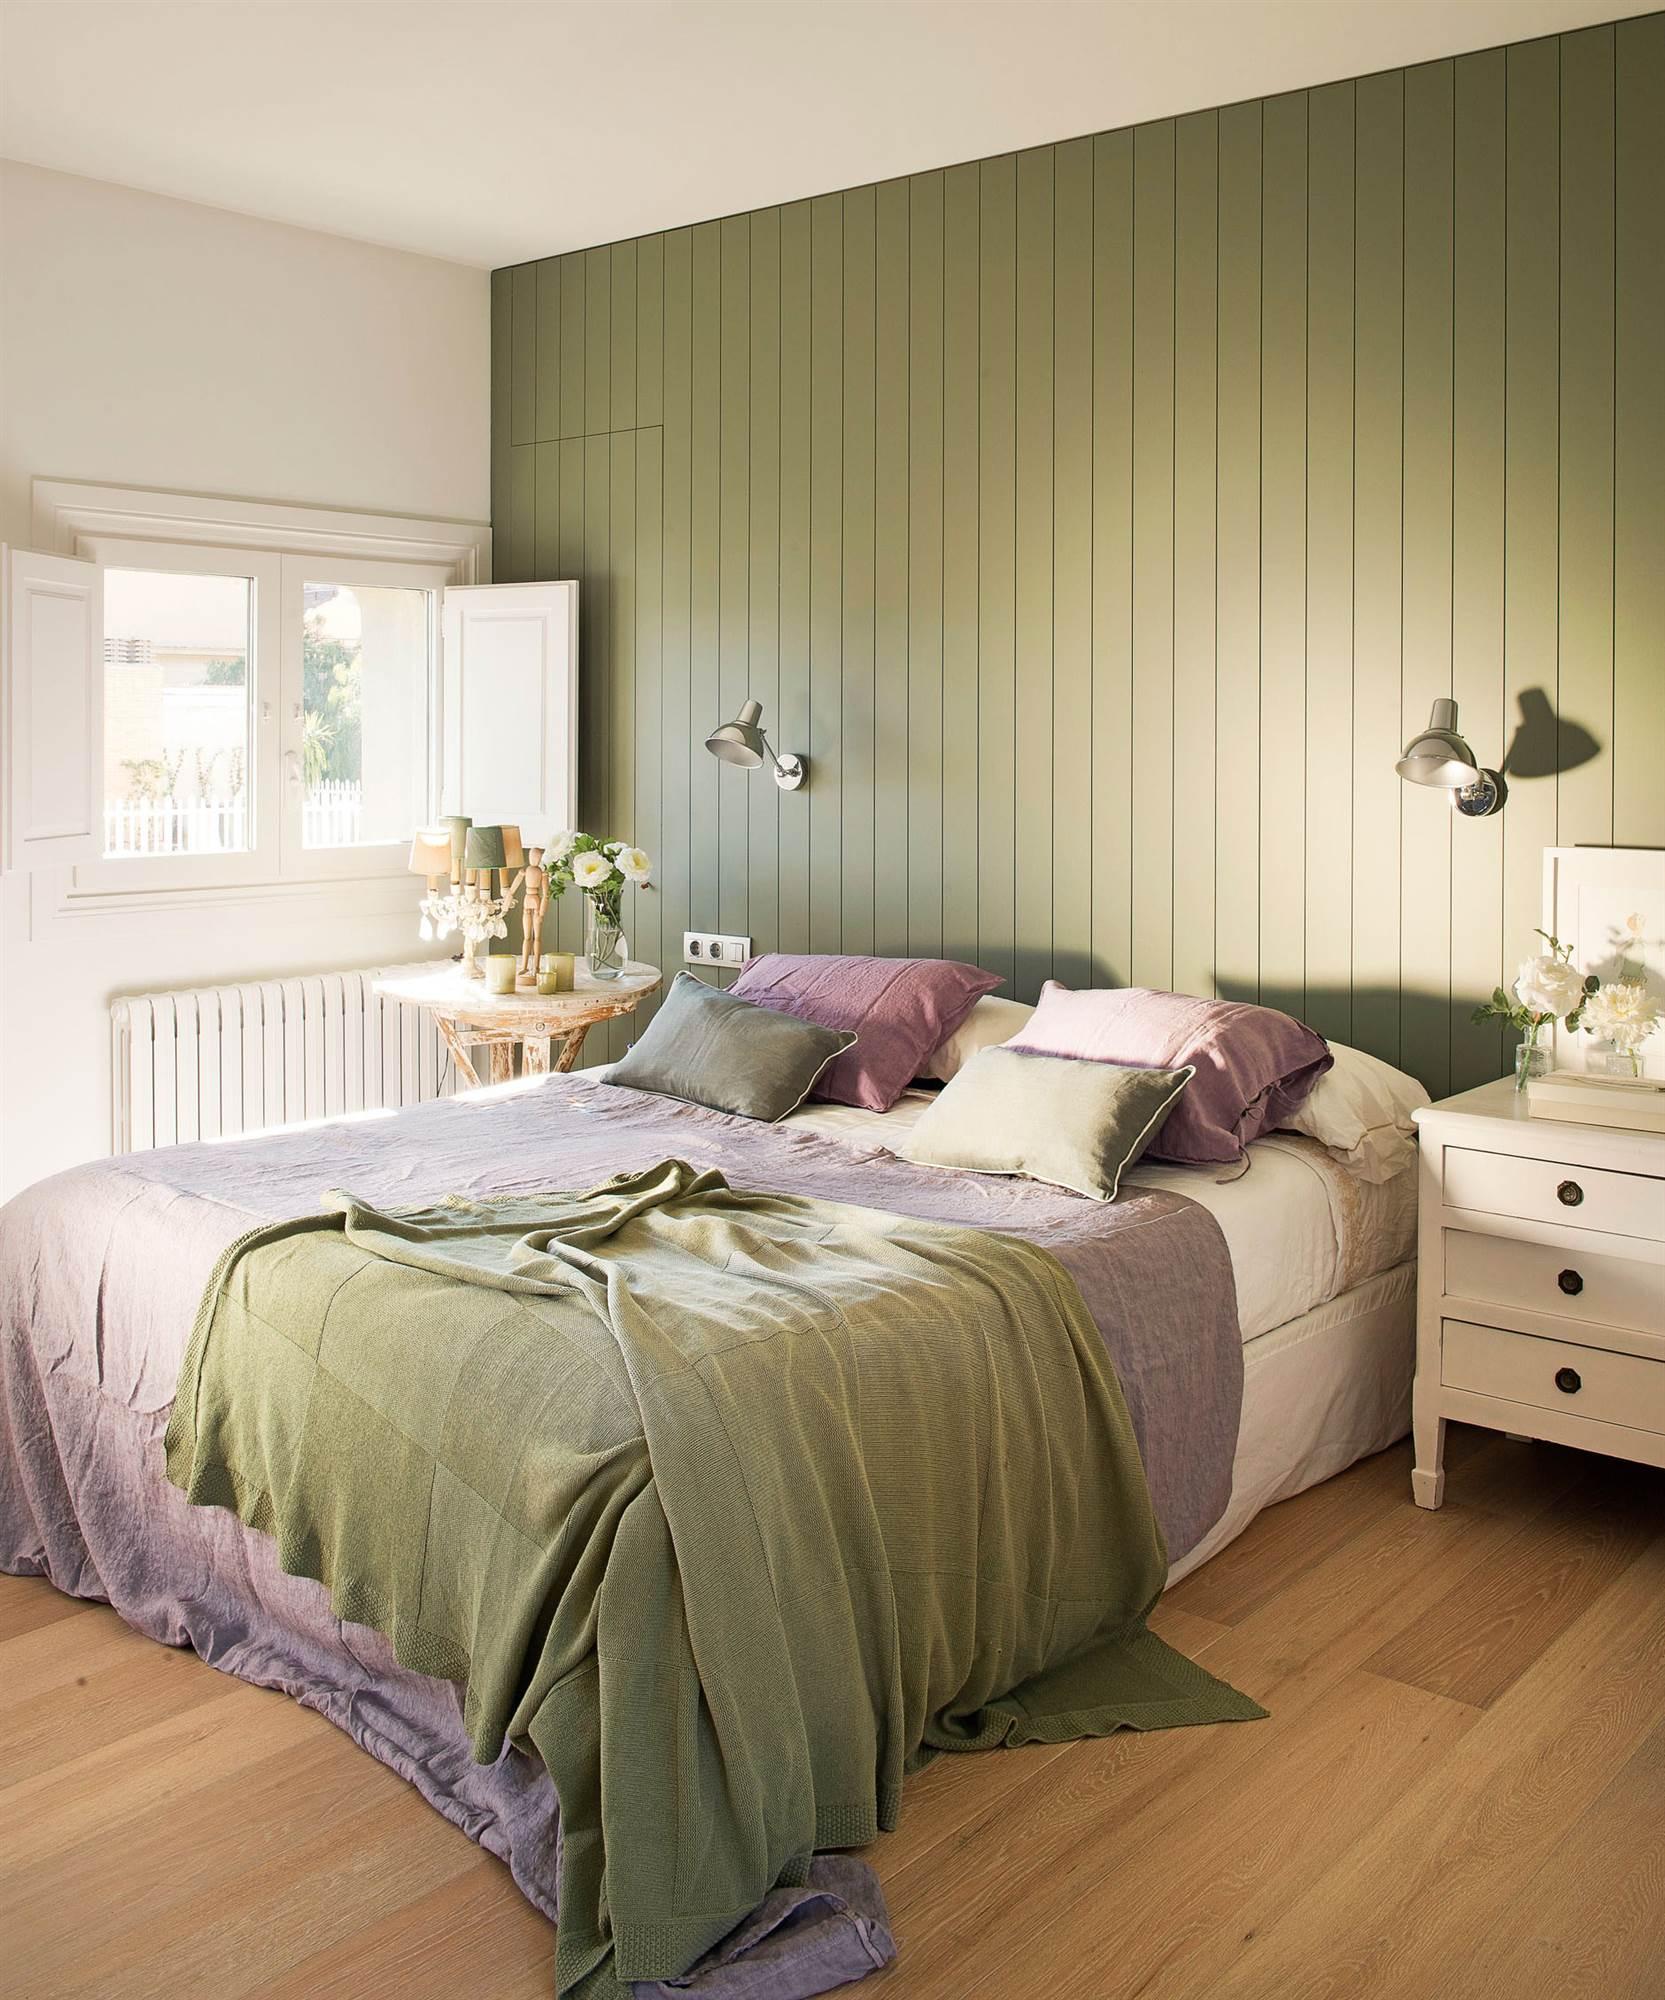 dormitorio con pared pintada de verde_TAURO-00359578